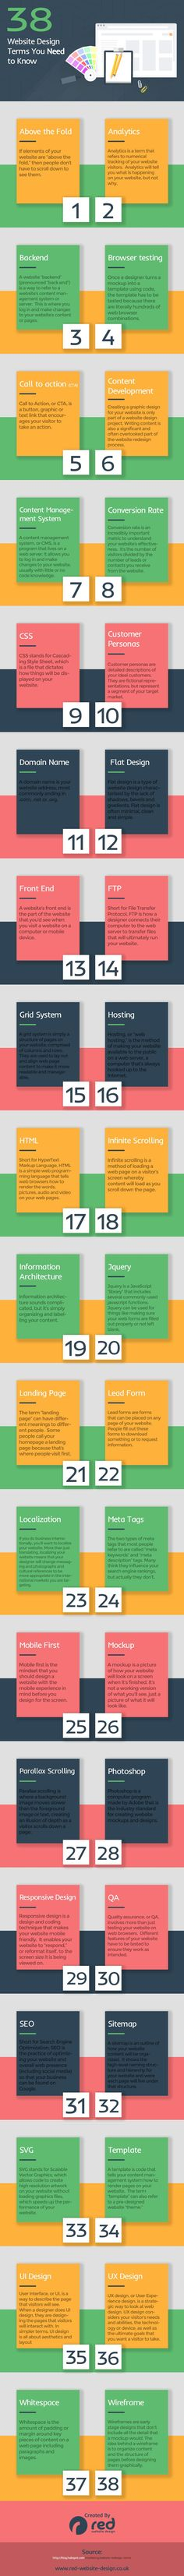 Don't Understand Web Design Talk? Here's 38 Terms You Need to Know (Tech Trends Web Design) News Website Design, Web Design Tips, Web Design Trends, Web Design Inspiration, App Design, Website Designs, Web Site Development, Design Development, Software Development